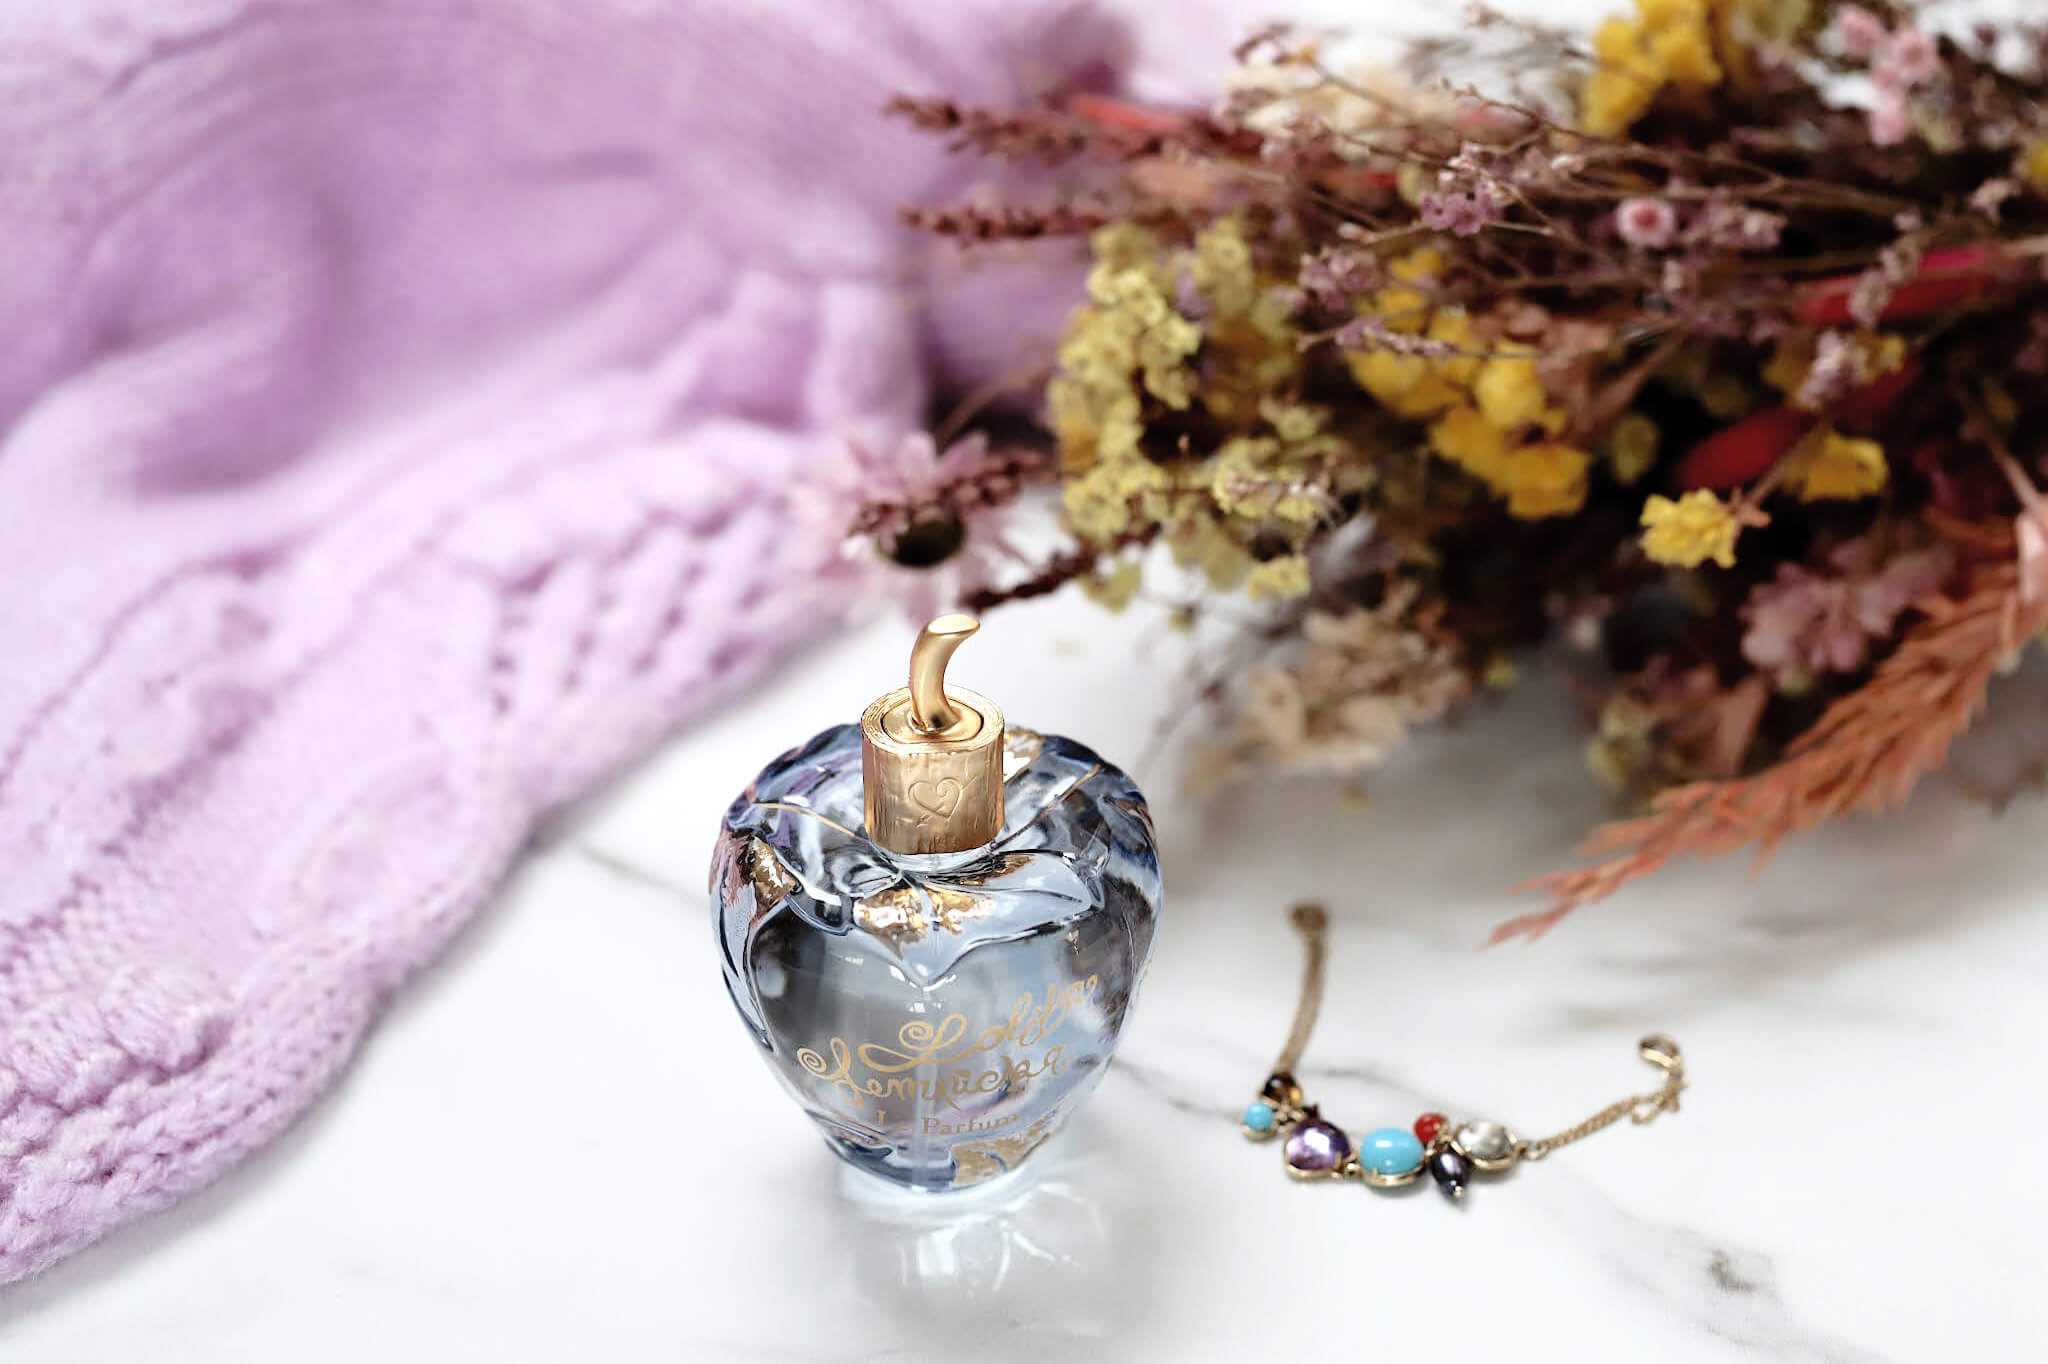 Lolita Lempicka Parfum version originelle